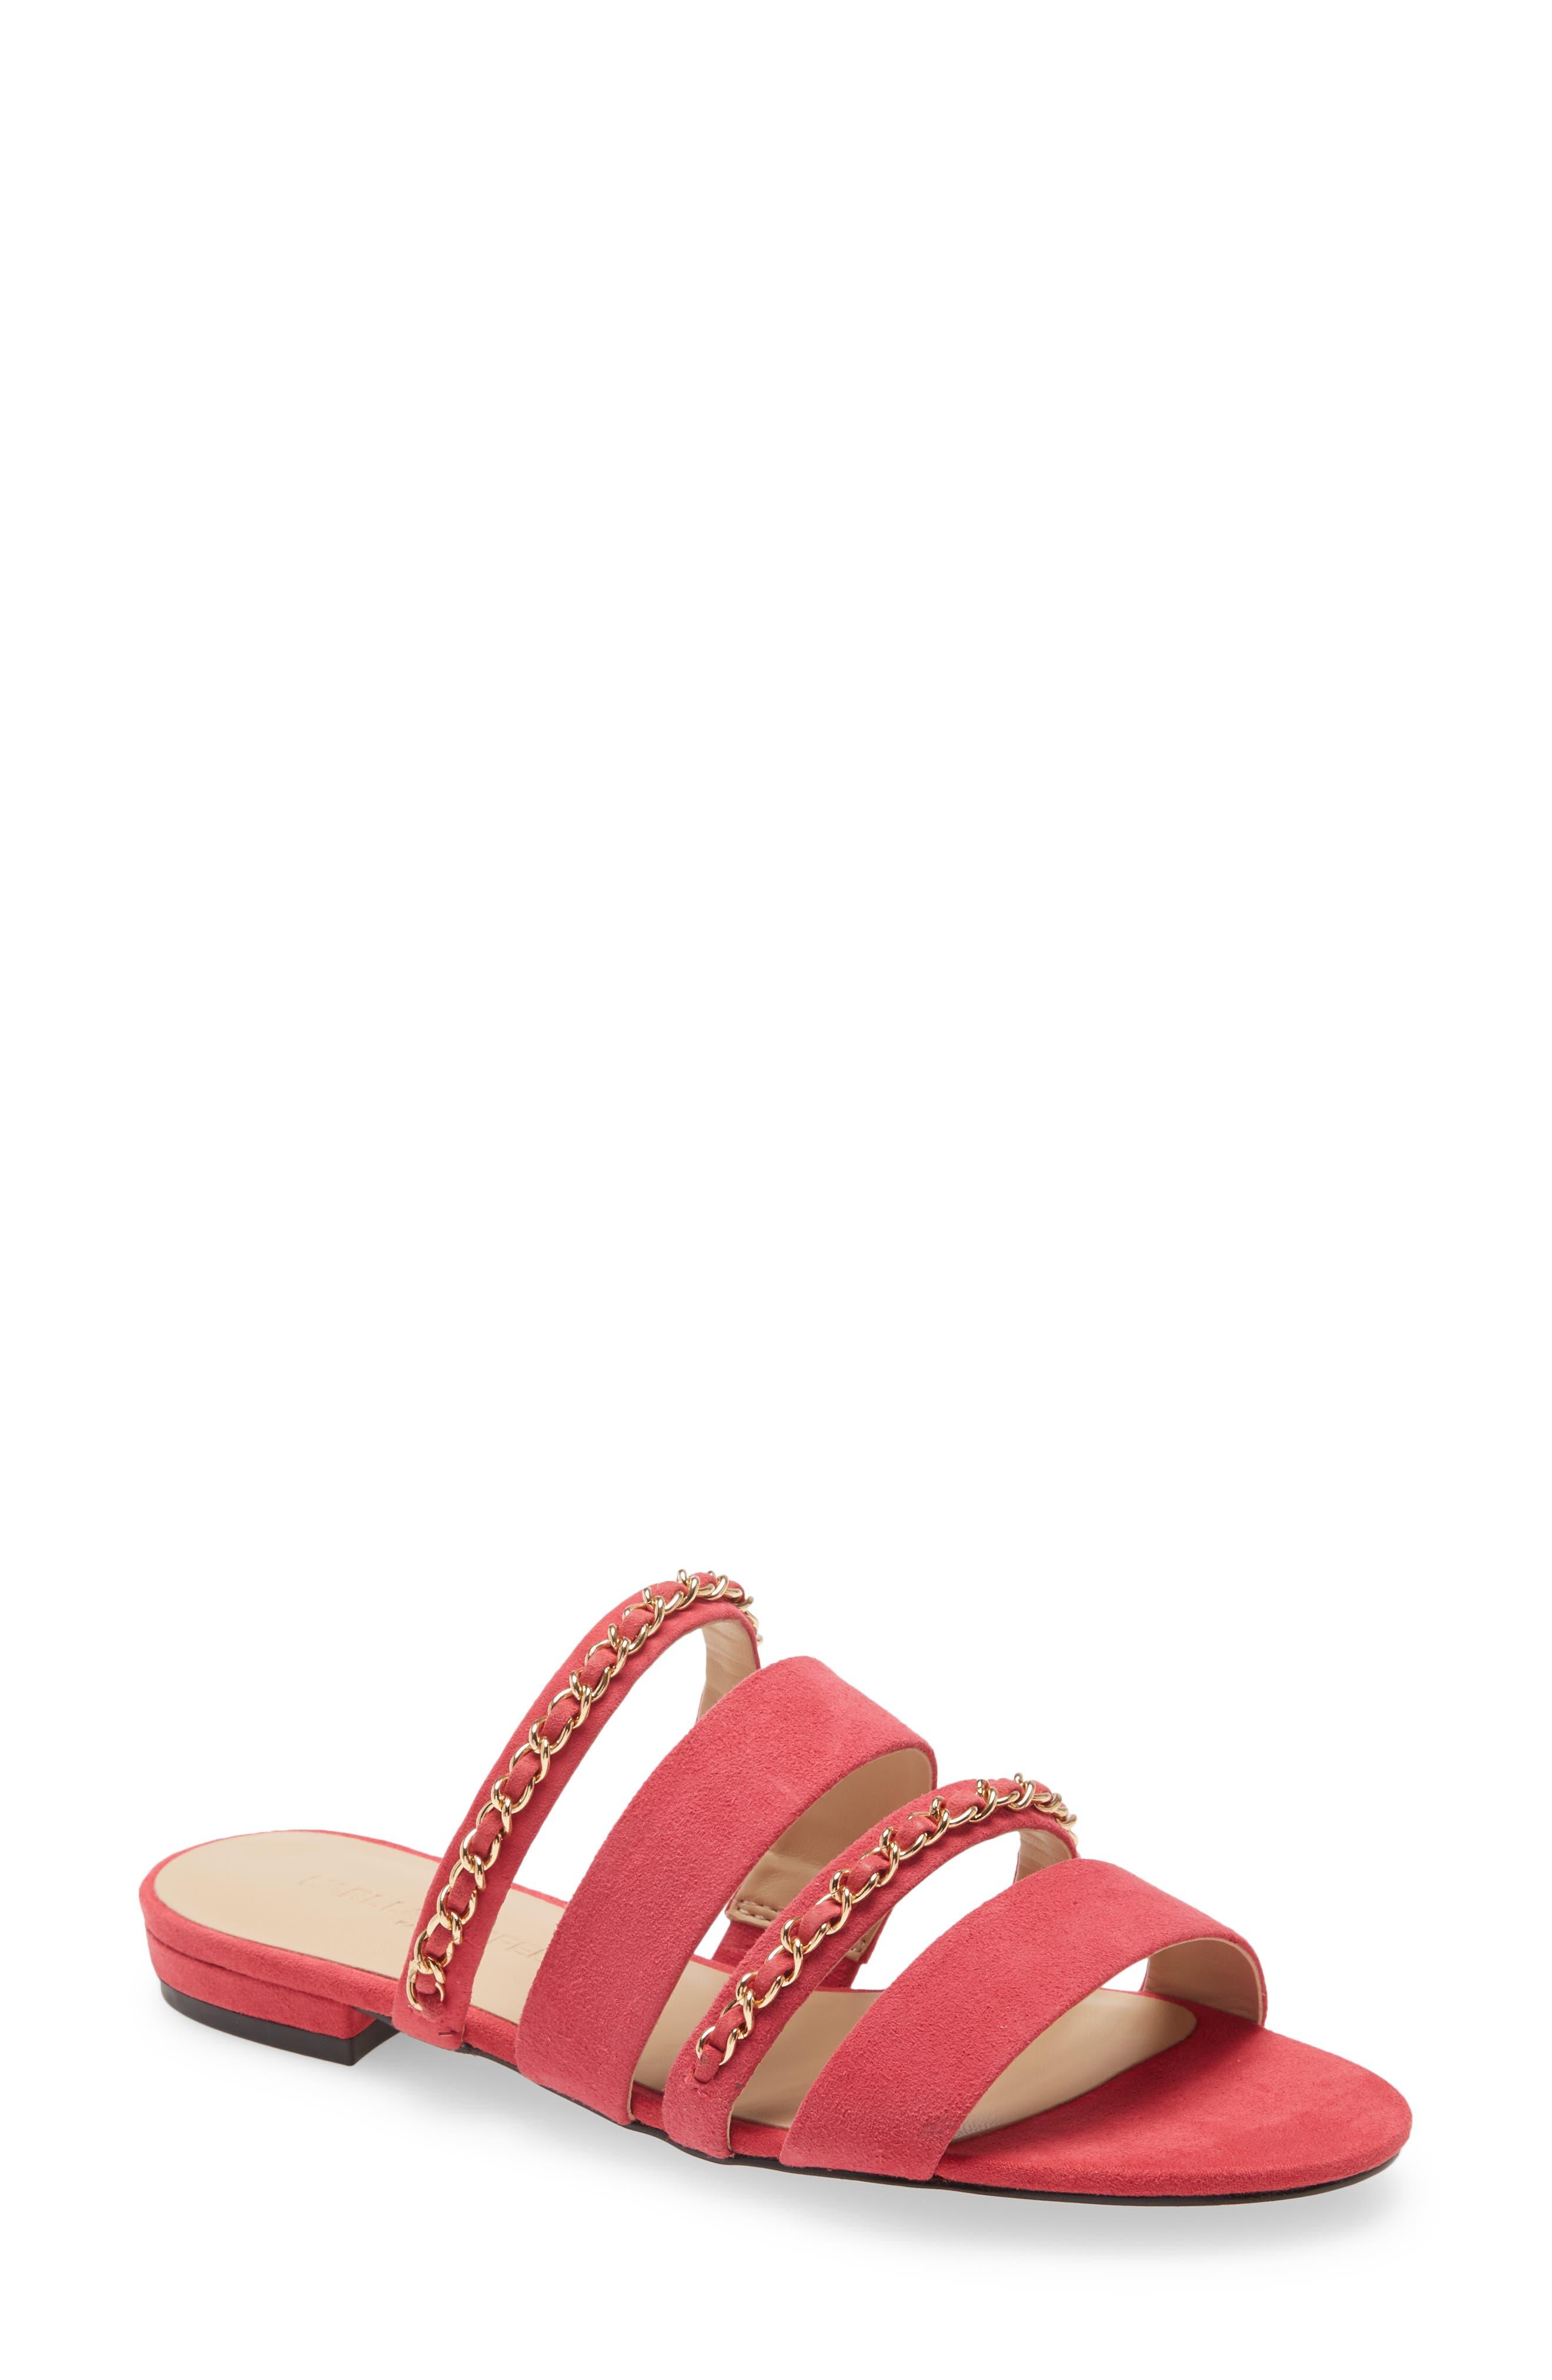 Caliana Slide Sandal